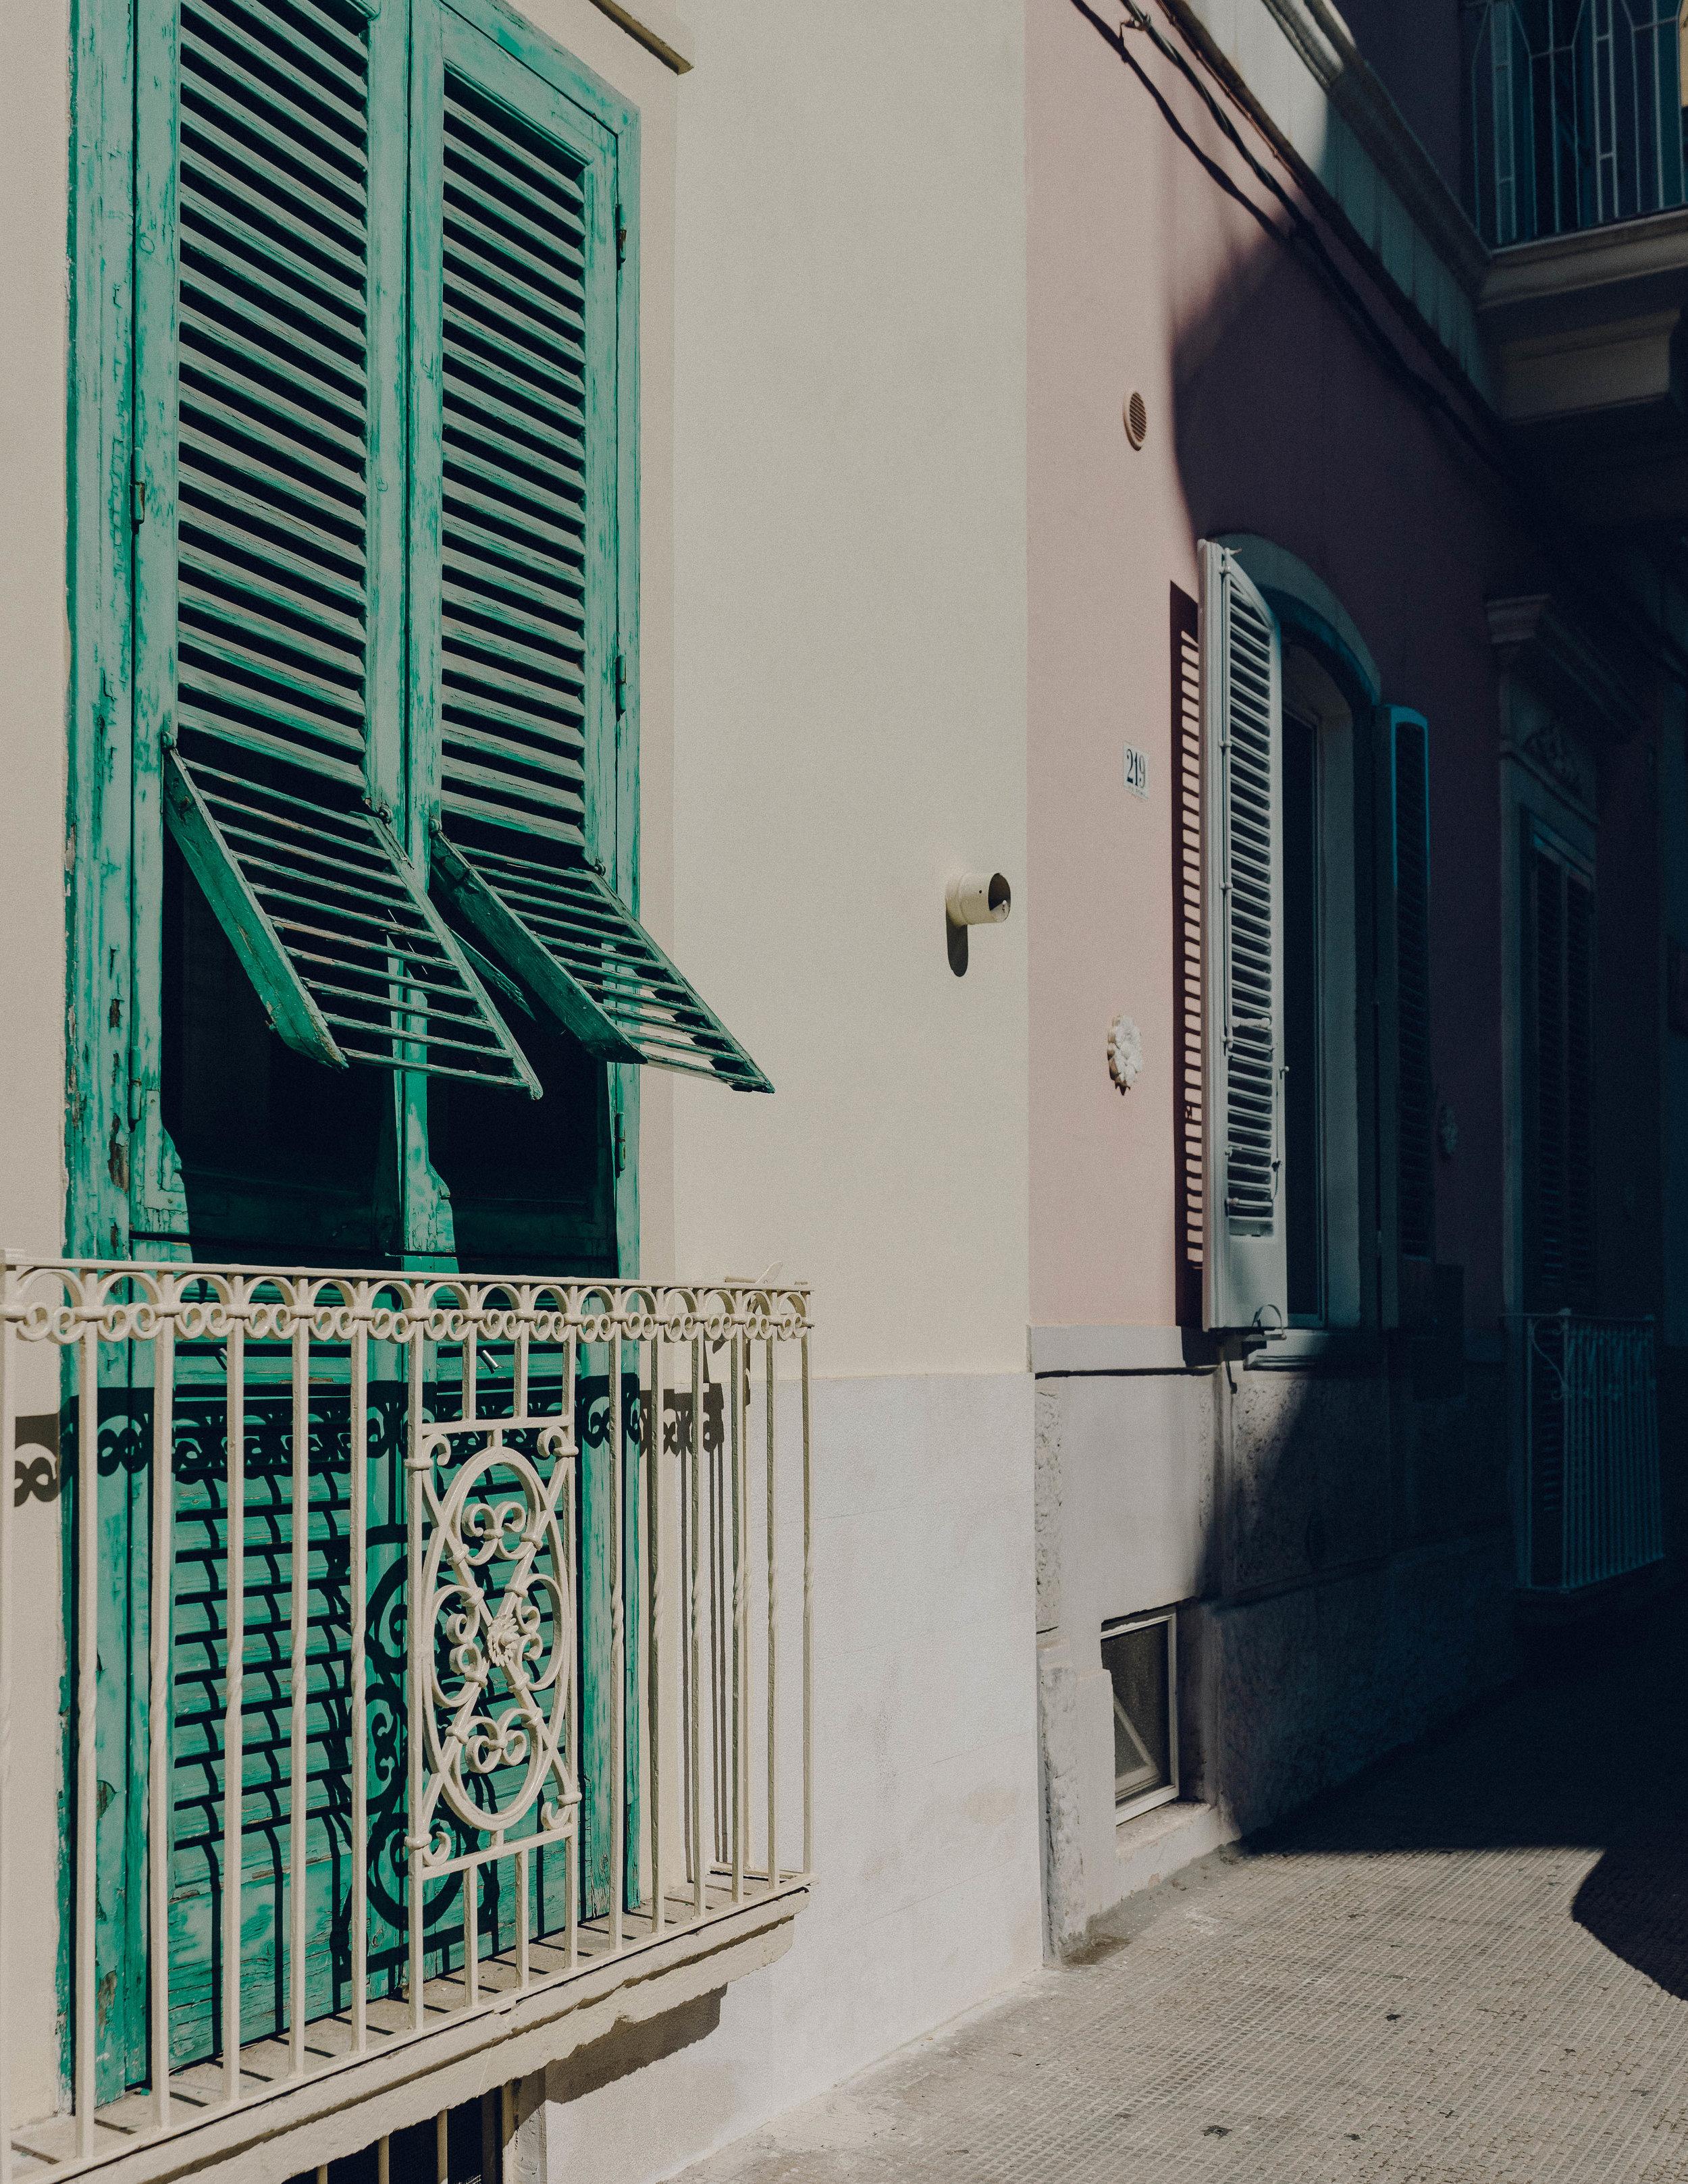 ASROSENVINGE_Roadtrip_Italy_Polignano_A_Mare-07023.jpg